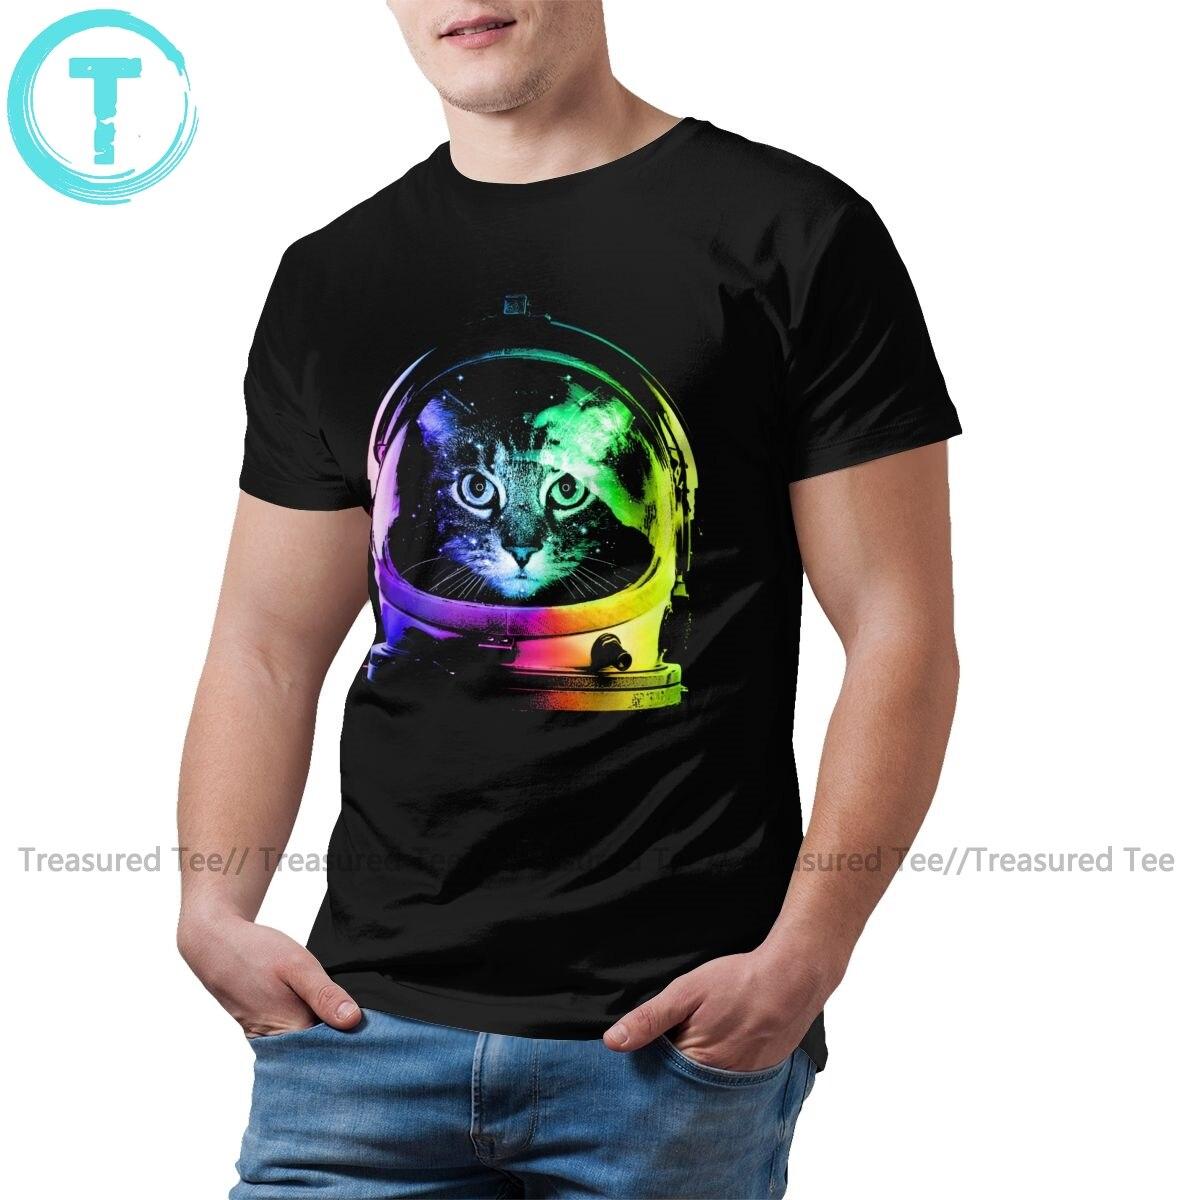 Camiseta de gatos del espacio camiseta de gato astronauta 100 por ciento algodón impreso camiseta divertida camiseta básica masculina